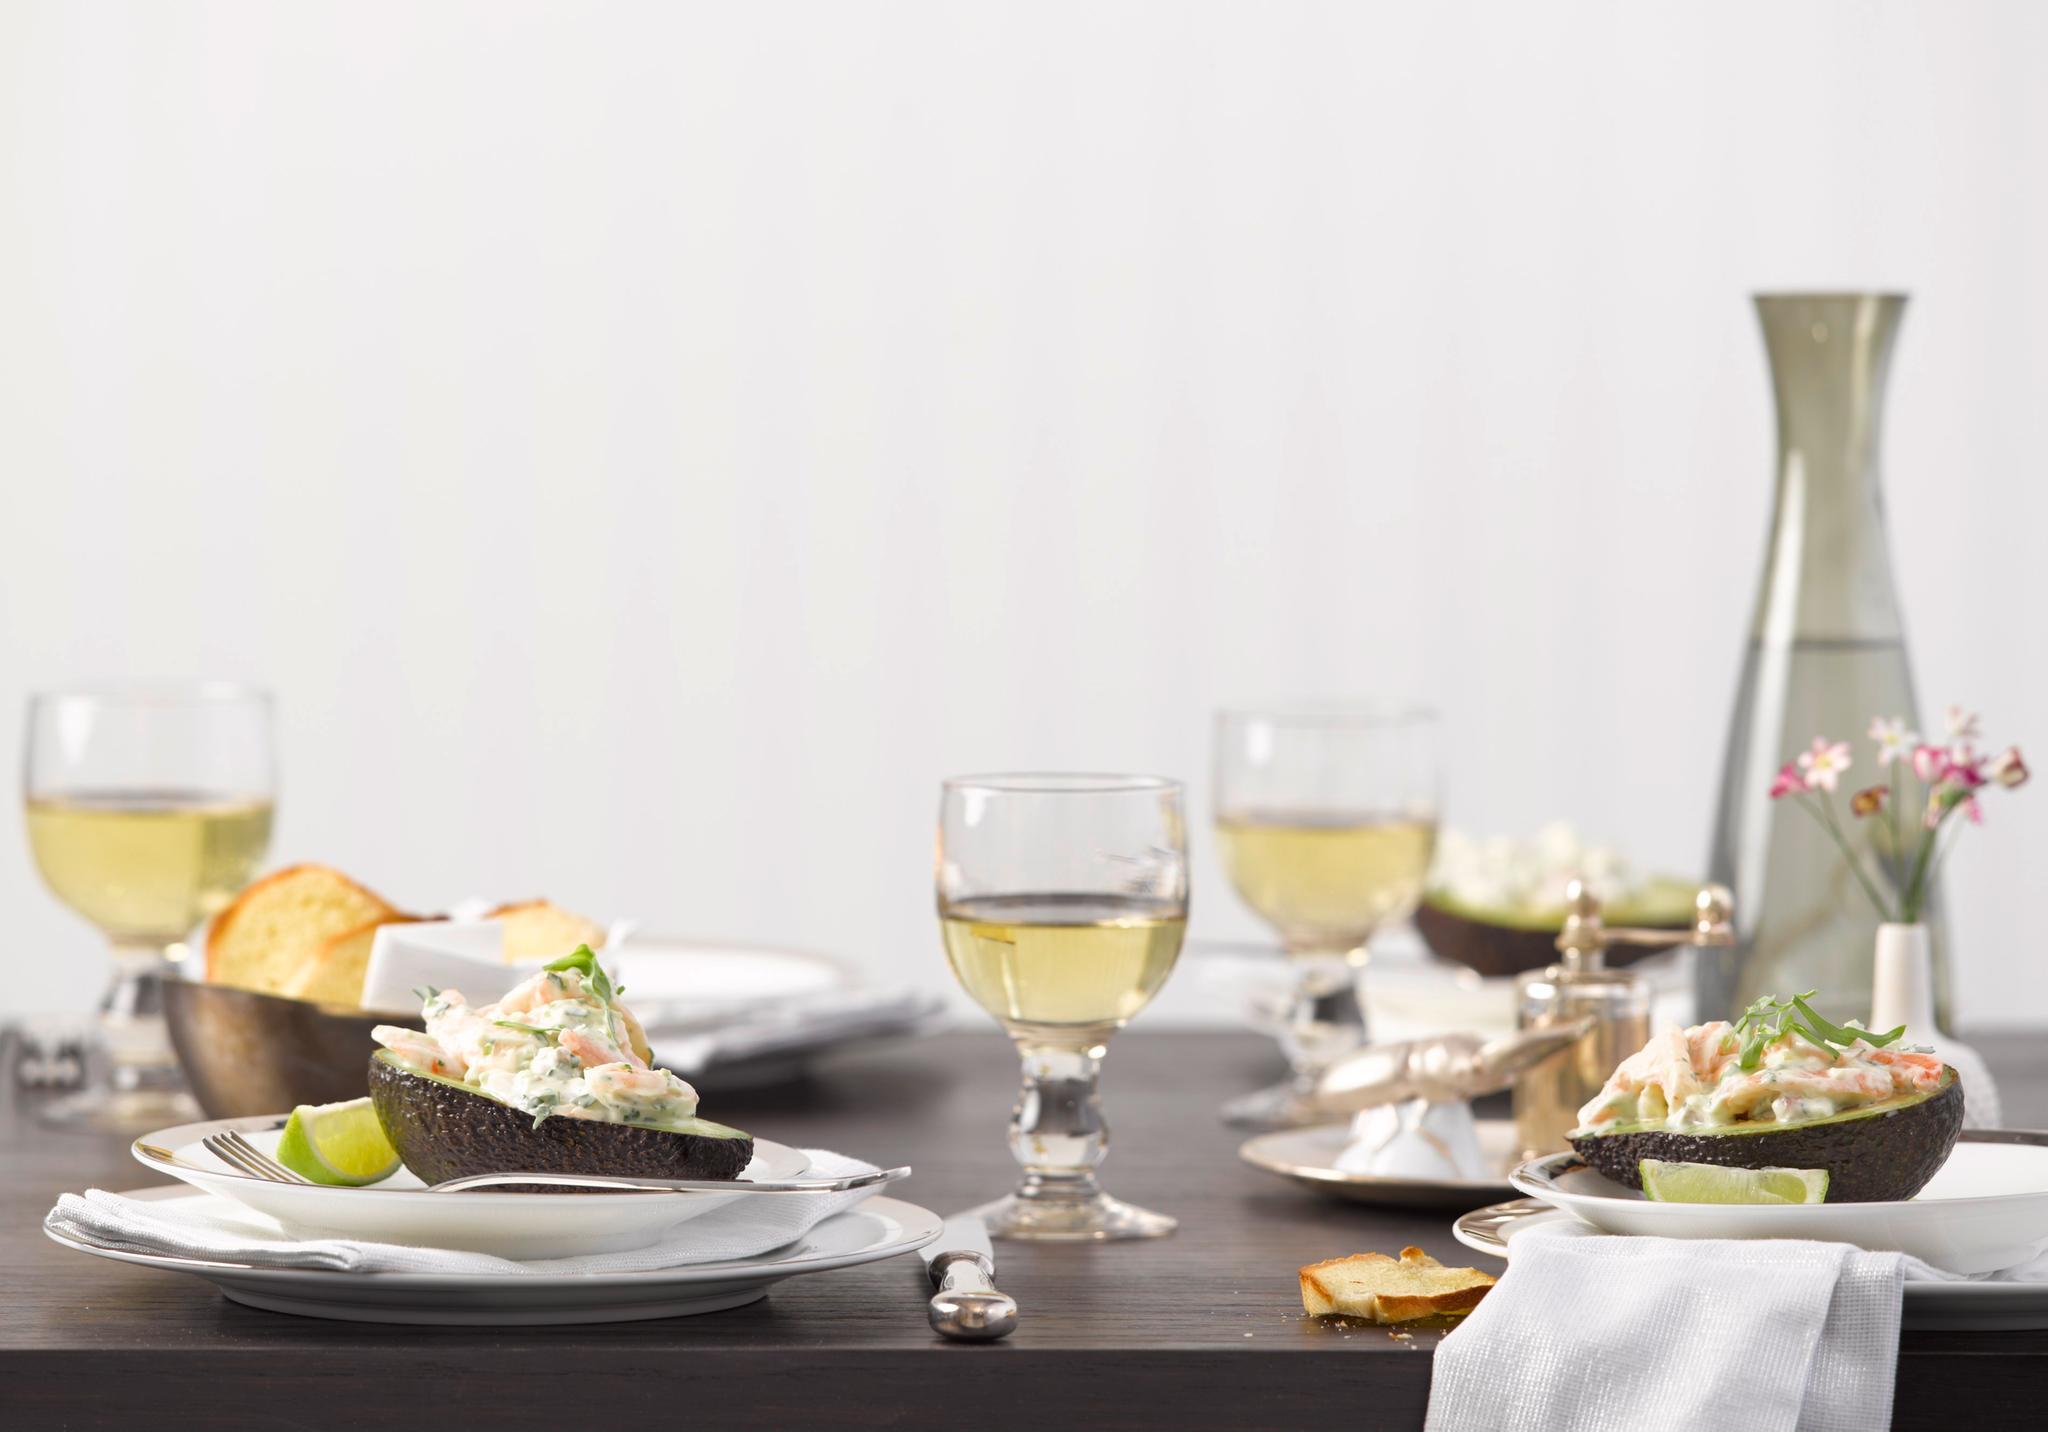 Sommer-Menü: Das gibt's heute zum Dinner!